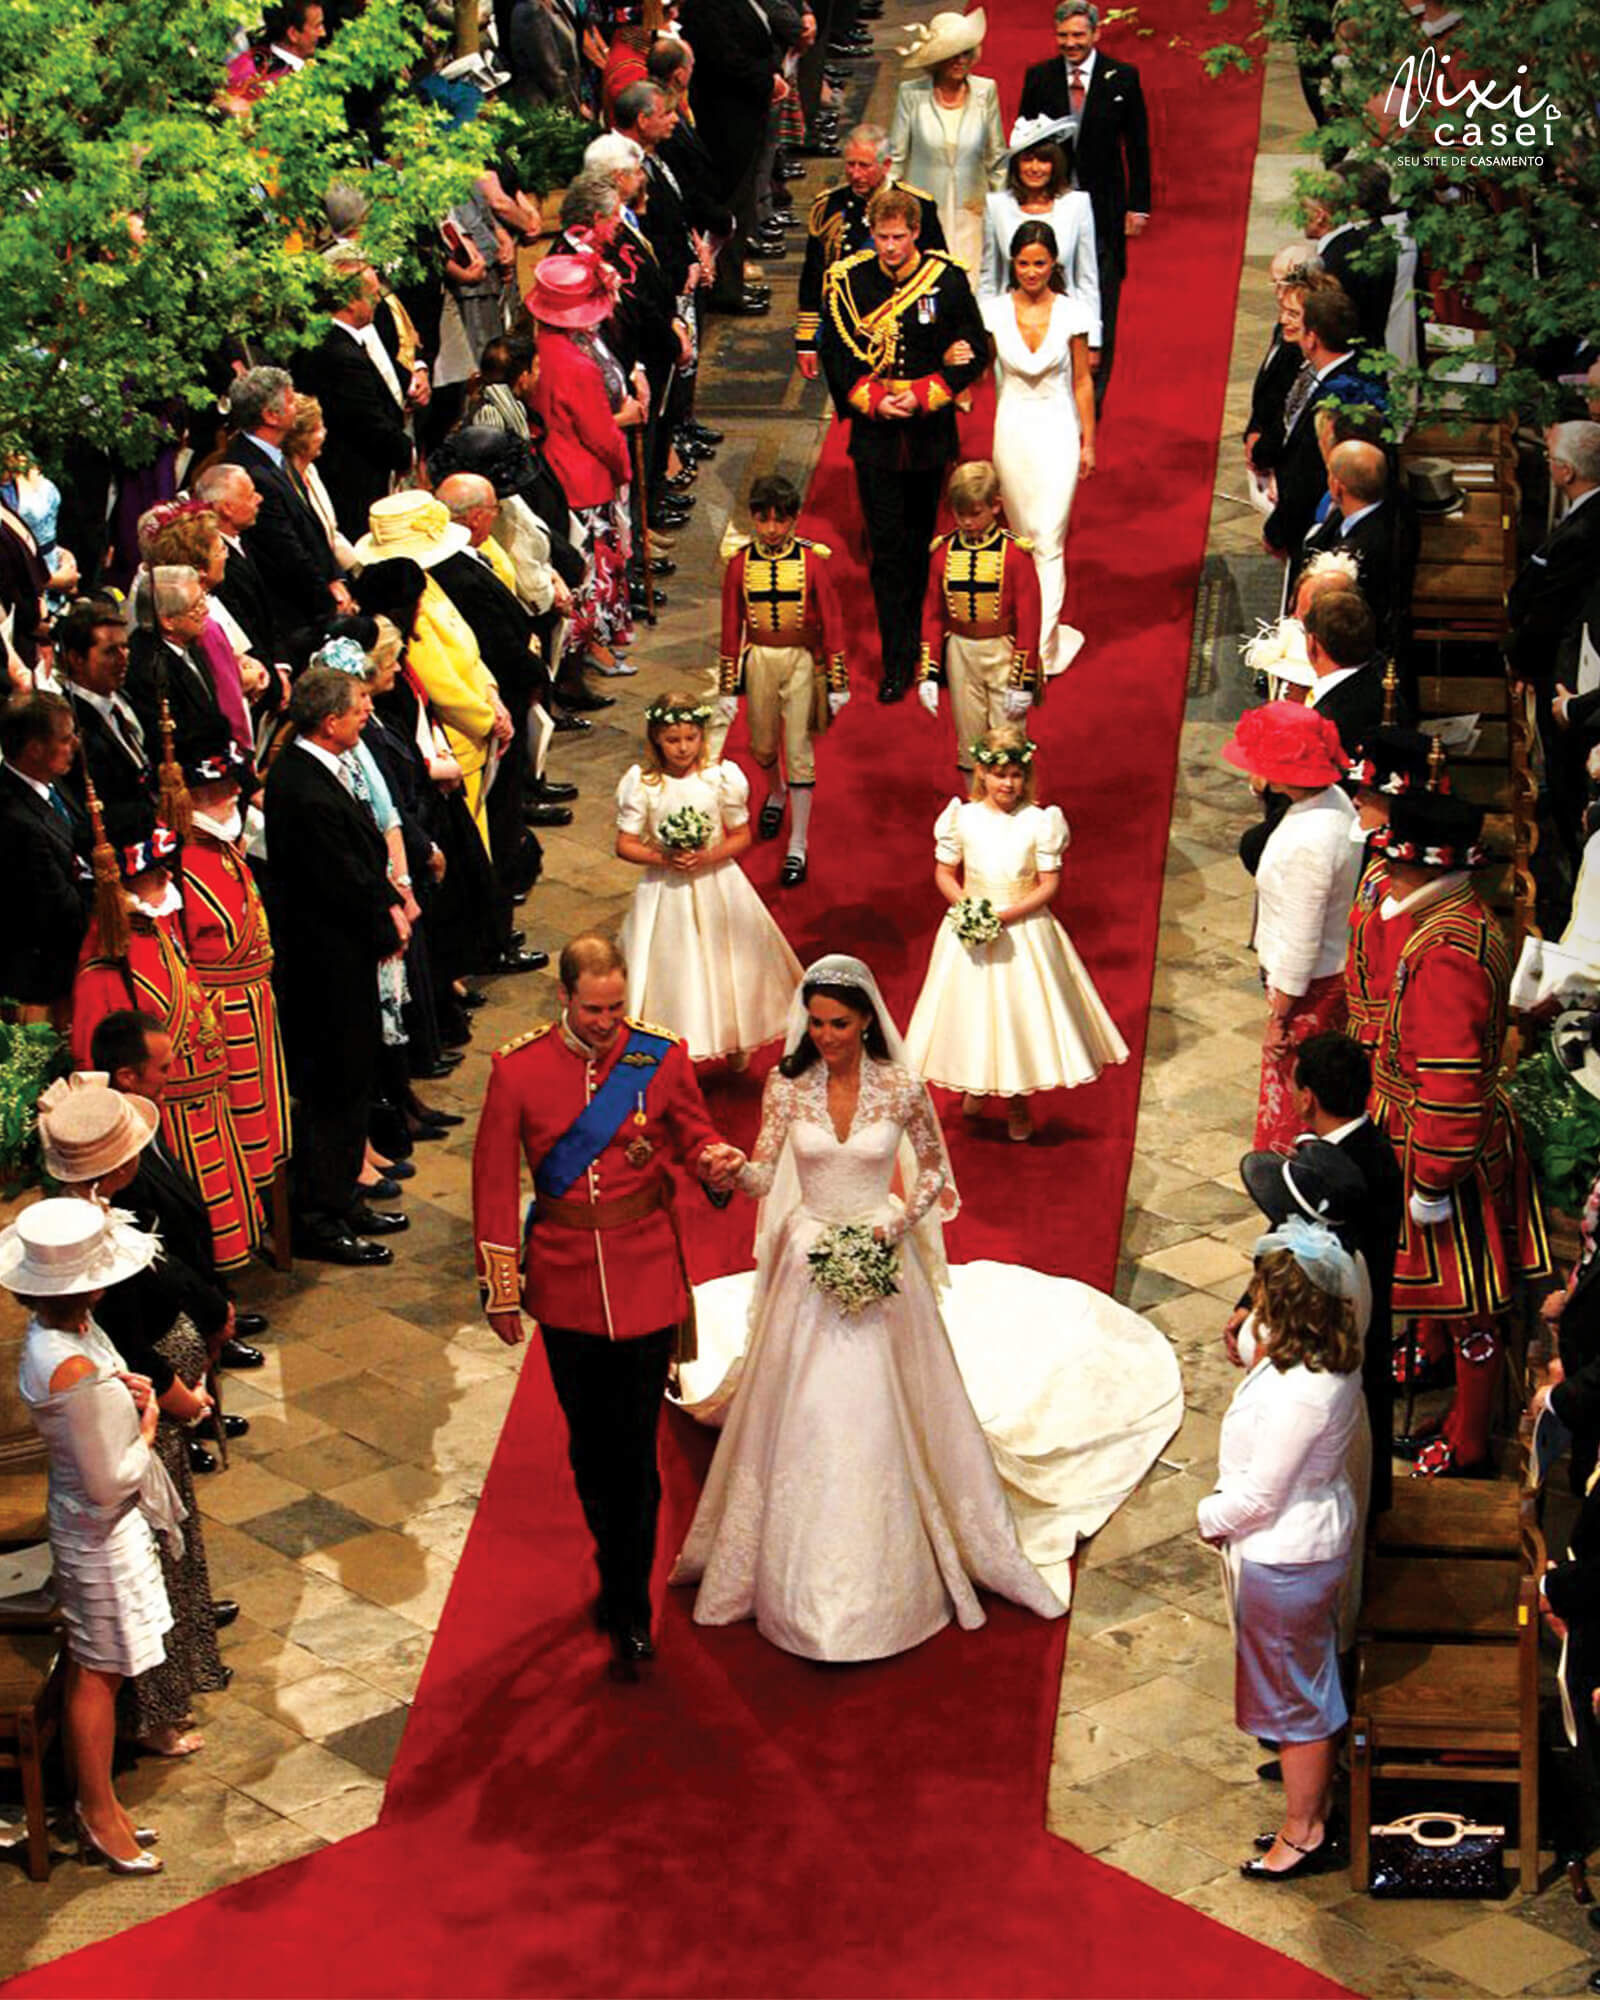 Excepcional Cortejo de casamento - Ordem de entrada e saída na cerimônia OH89